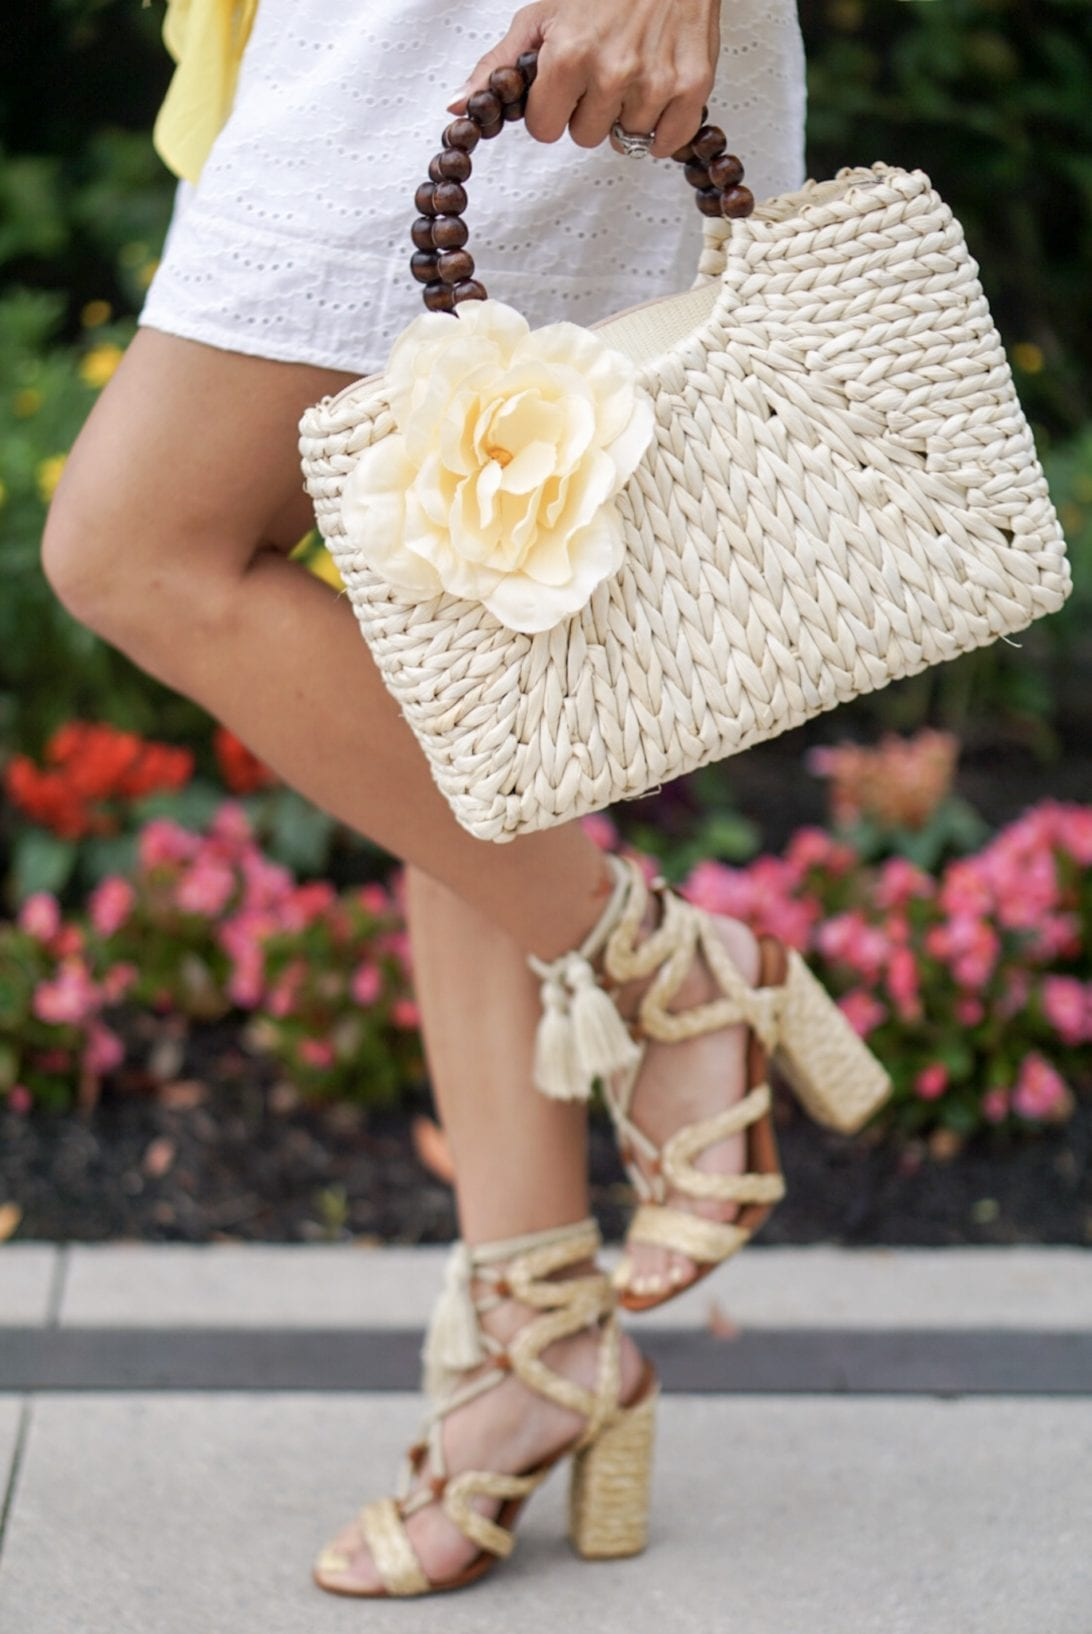 lace up blog heels, summer heels, summer sandals, floral summer bag, beach bag, straw bag